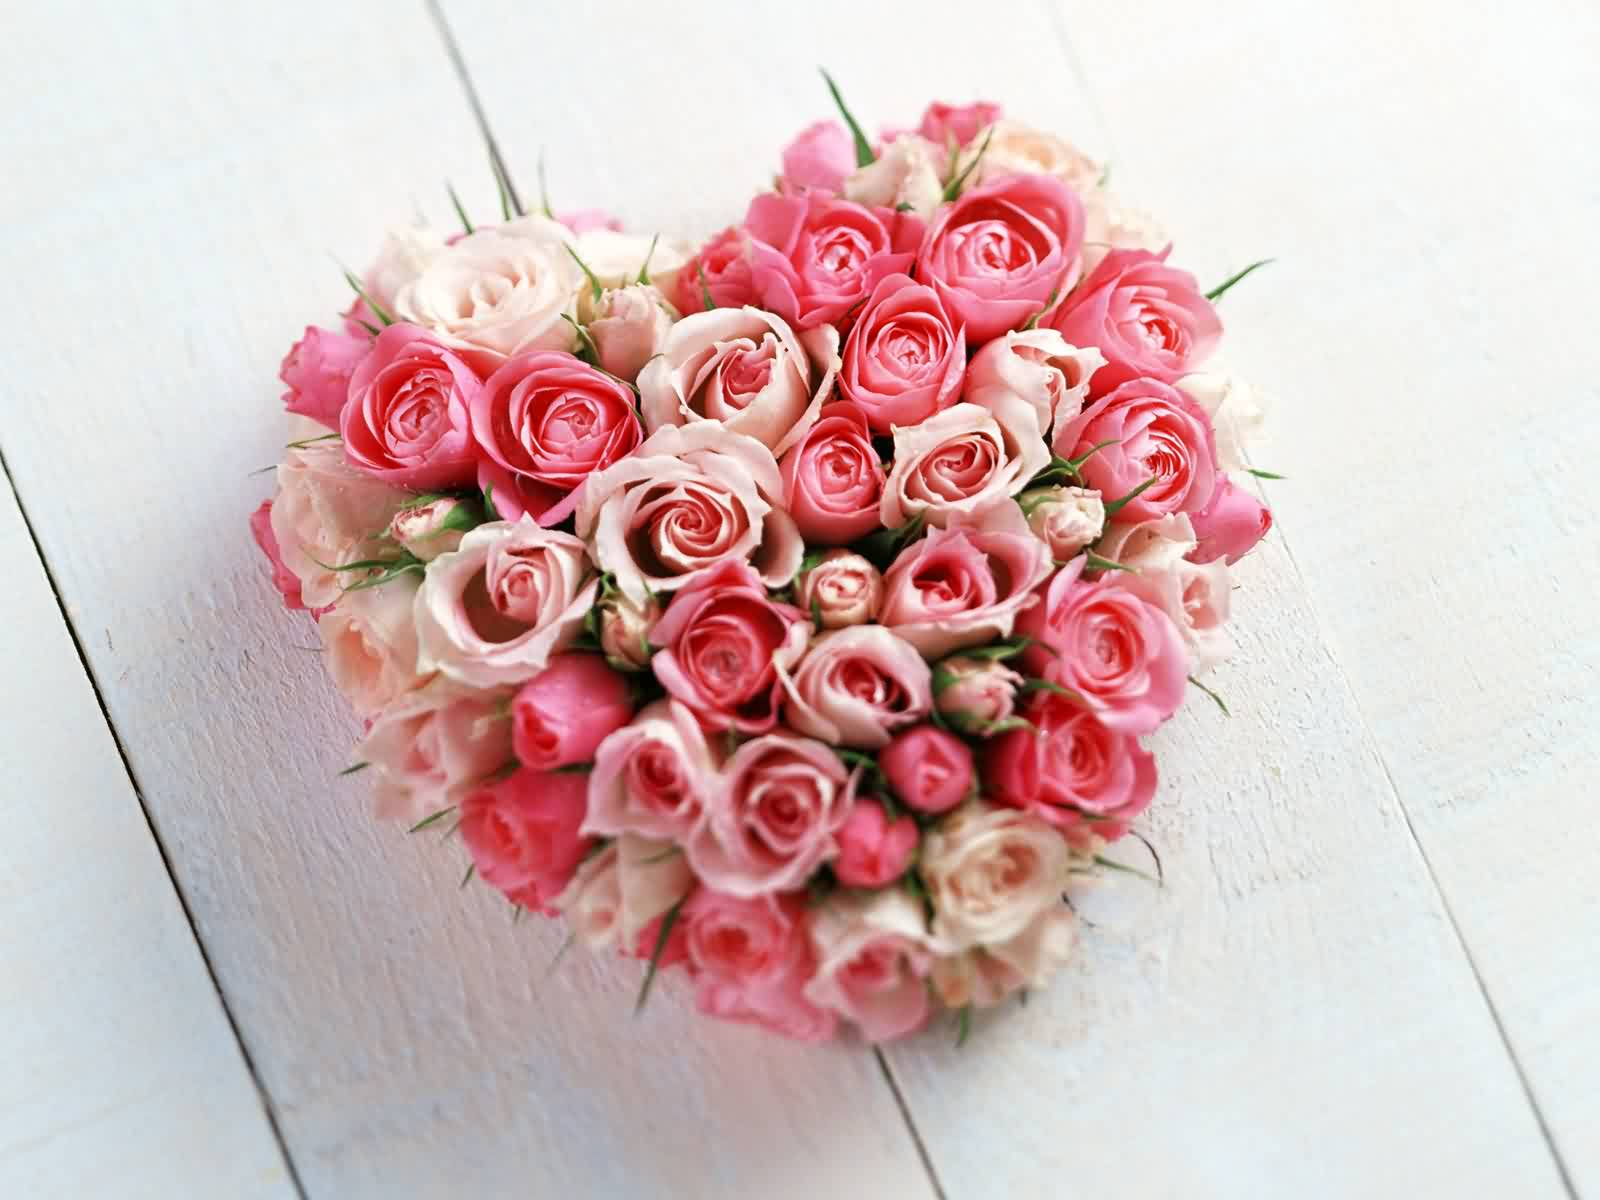 Фото цветы миллион роз